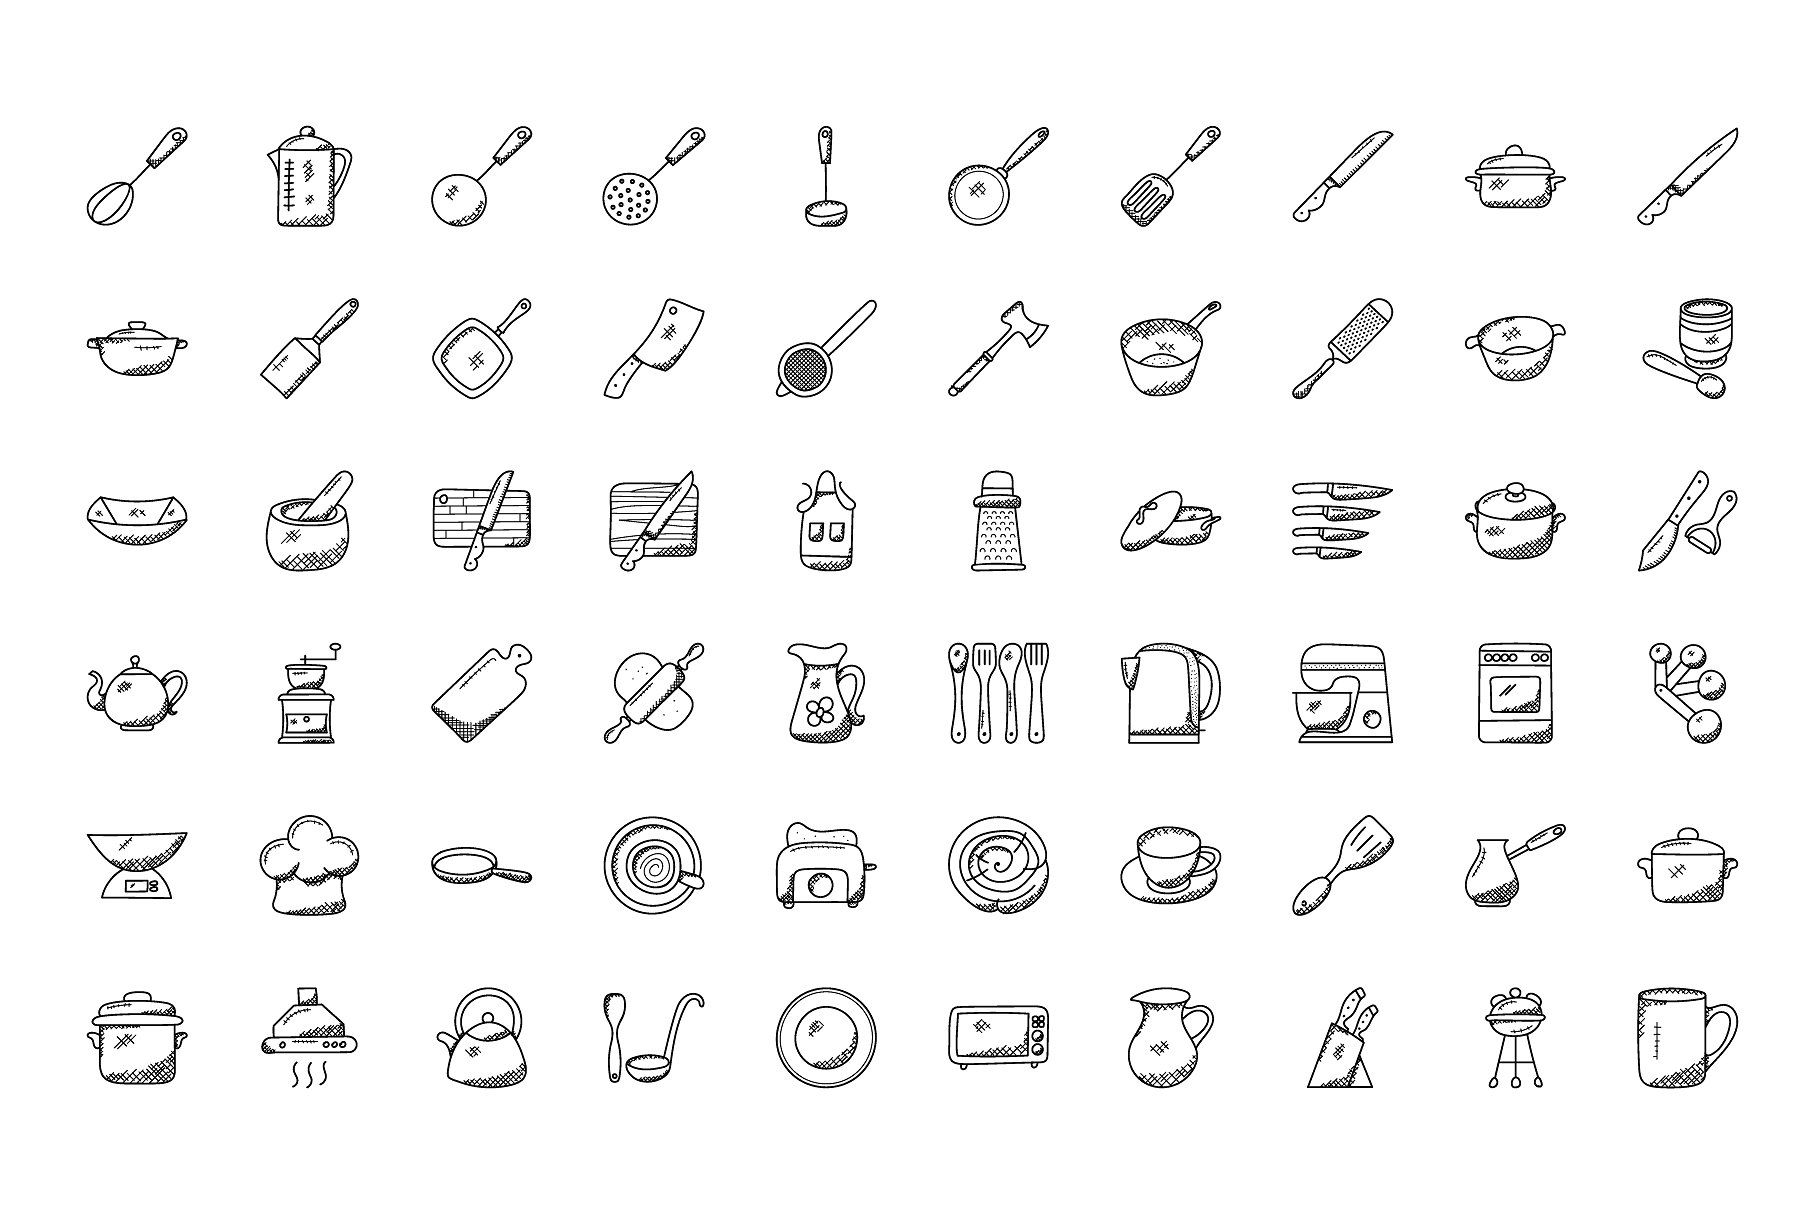 100 Doodles Of Kitchen Utensils Doodles Kitchen Icons